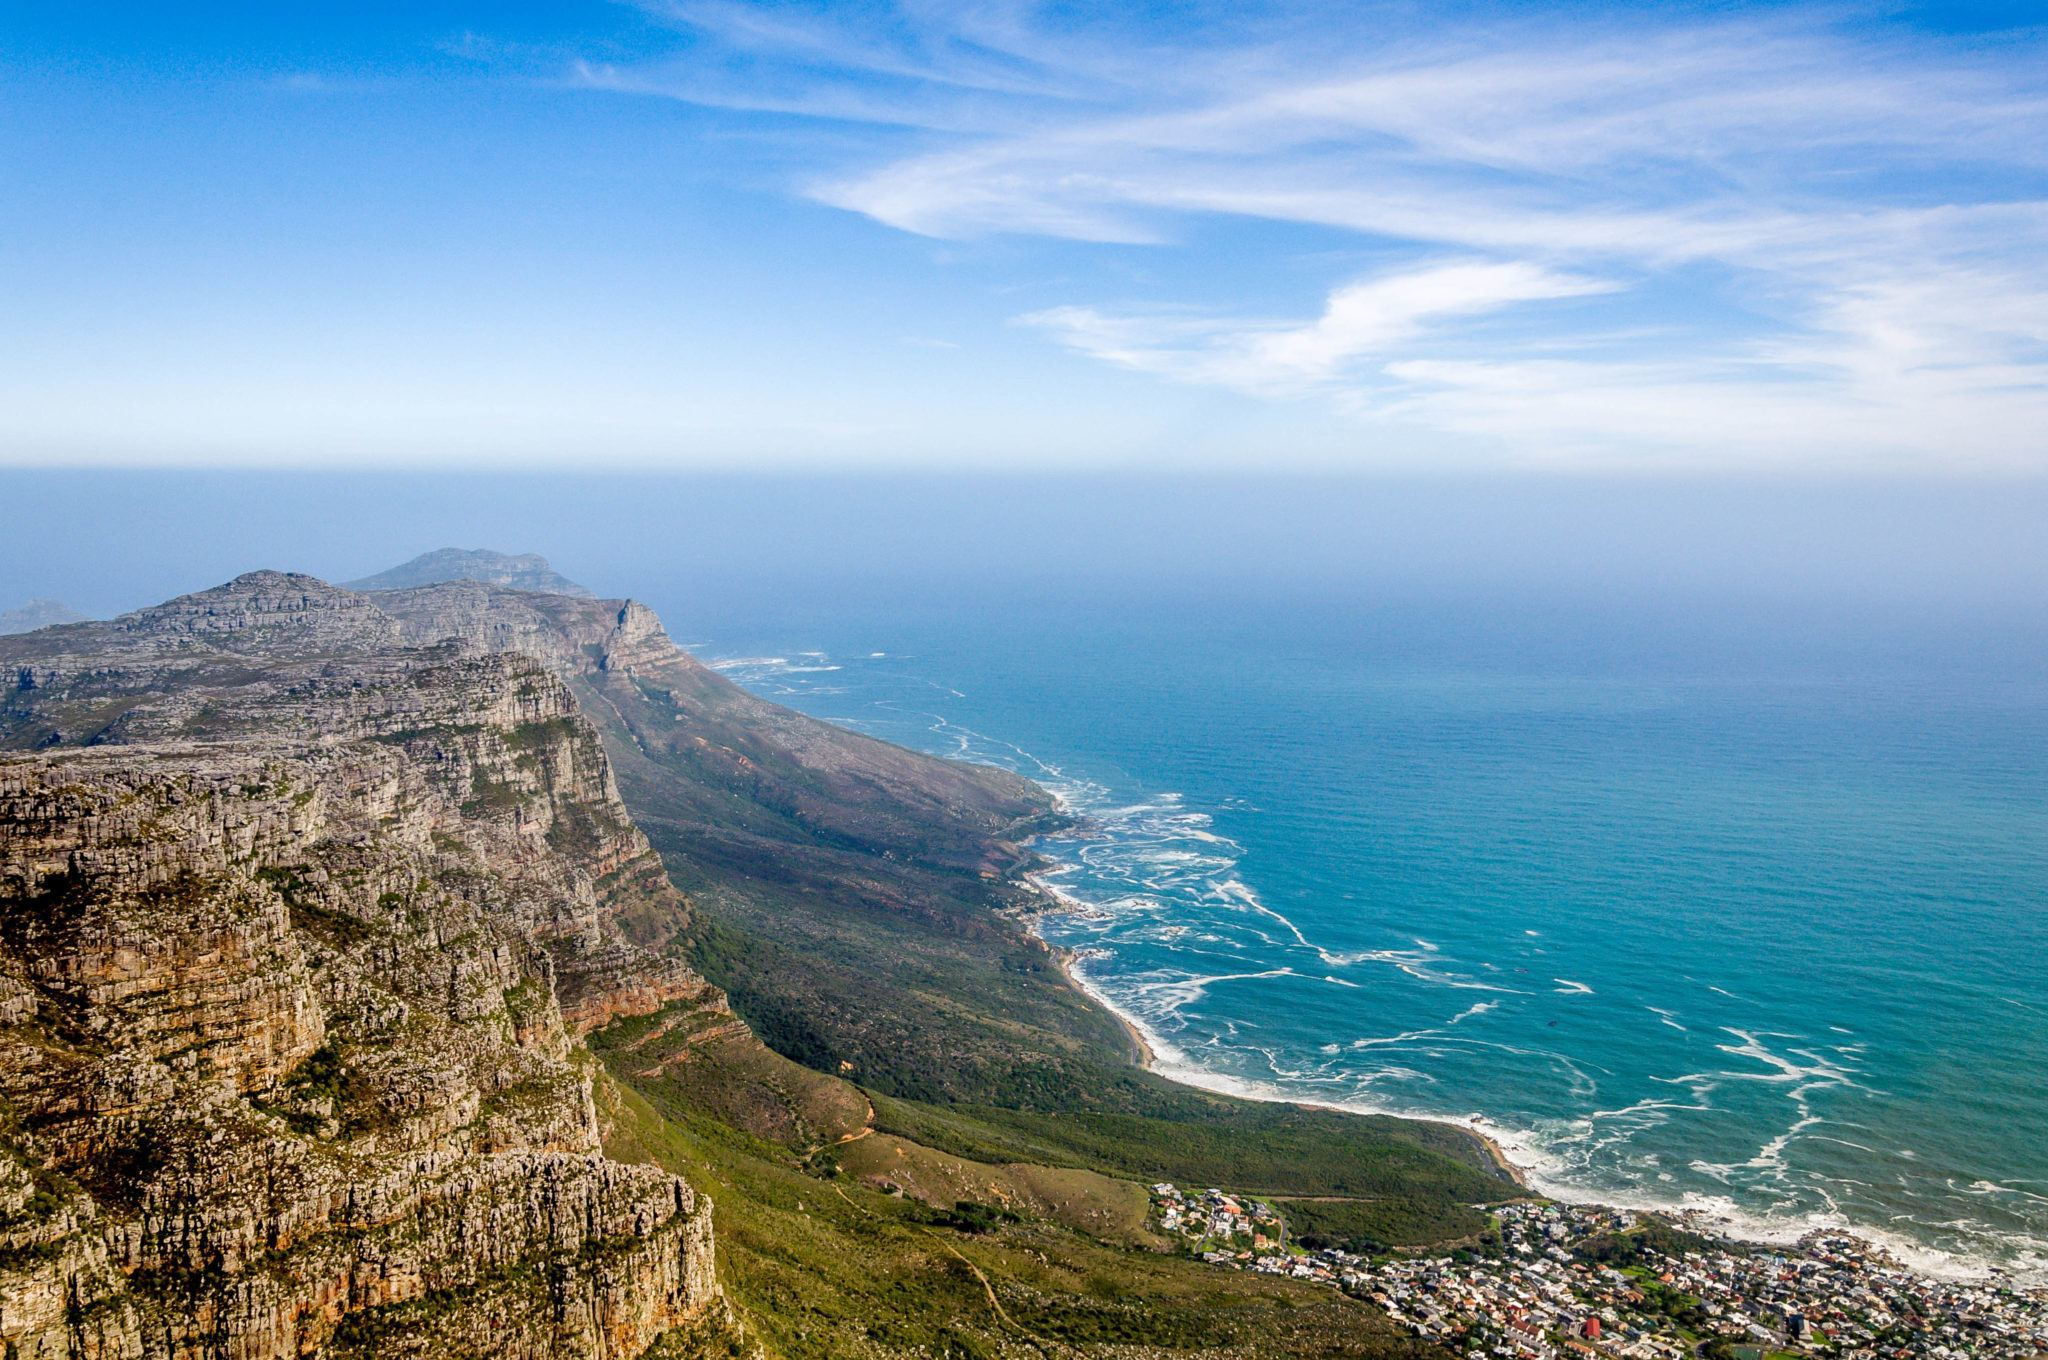 Table Mountain overlooking the ocean